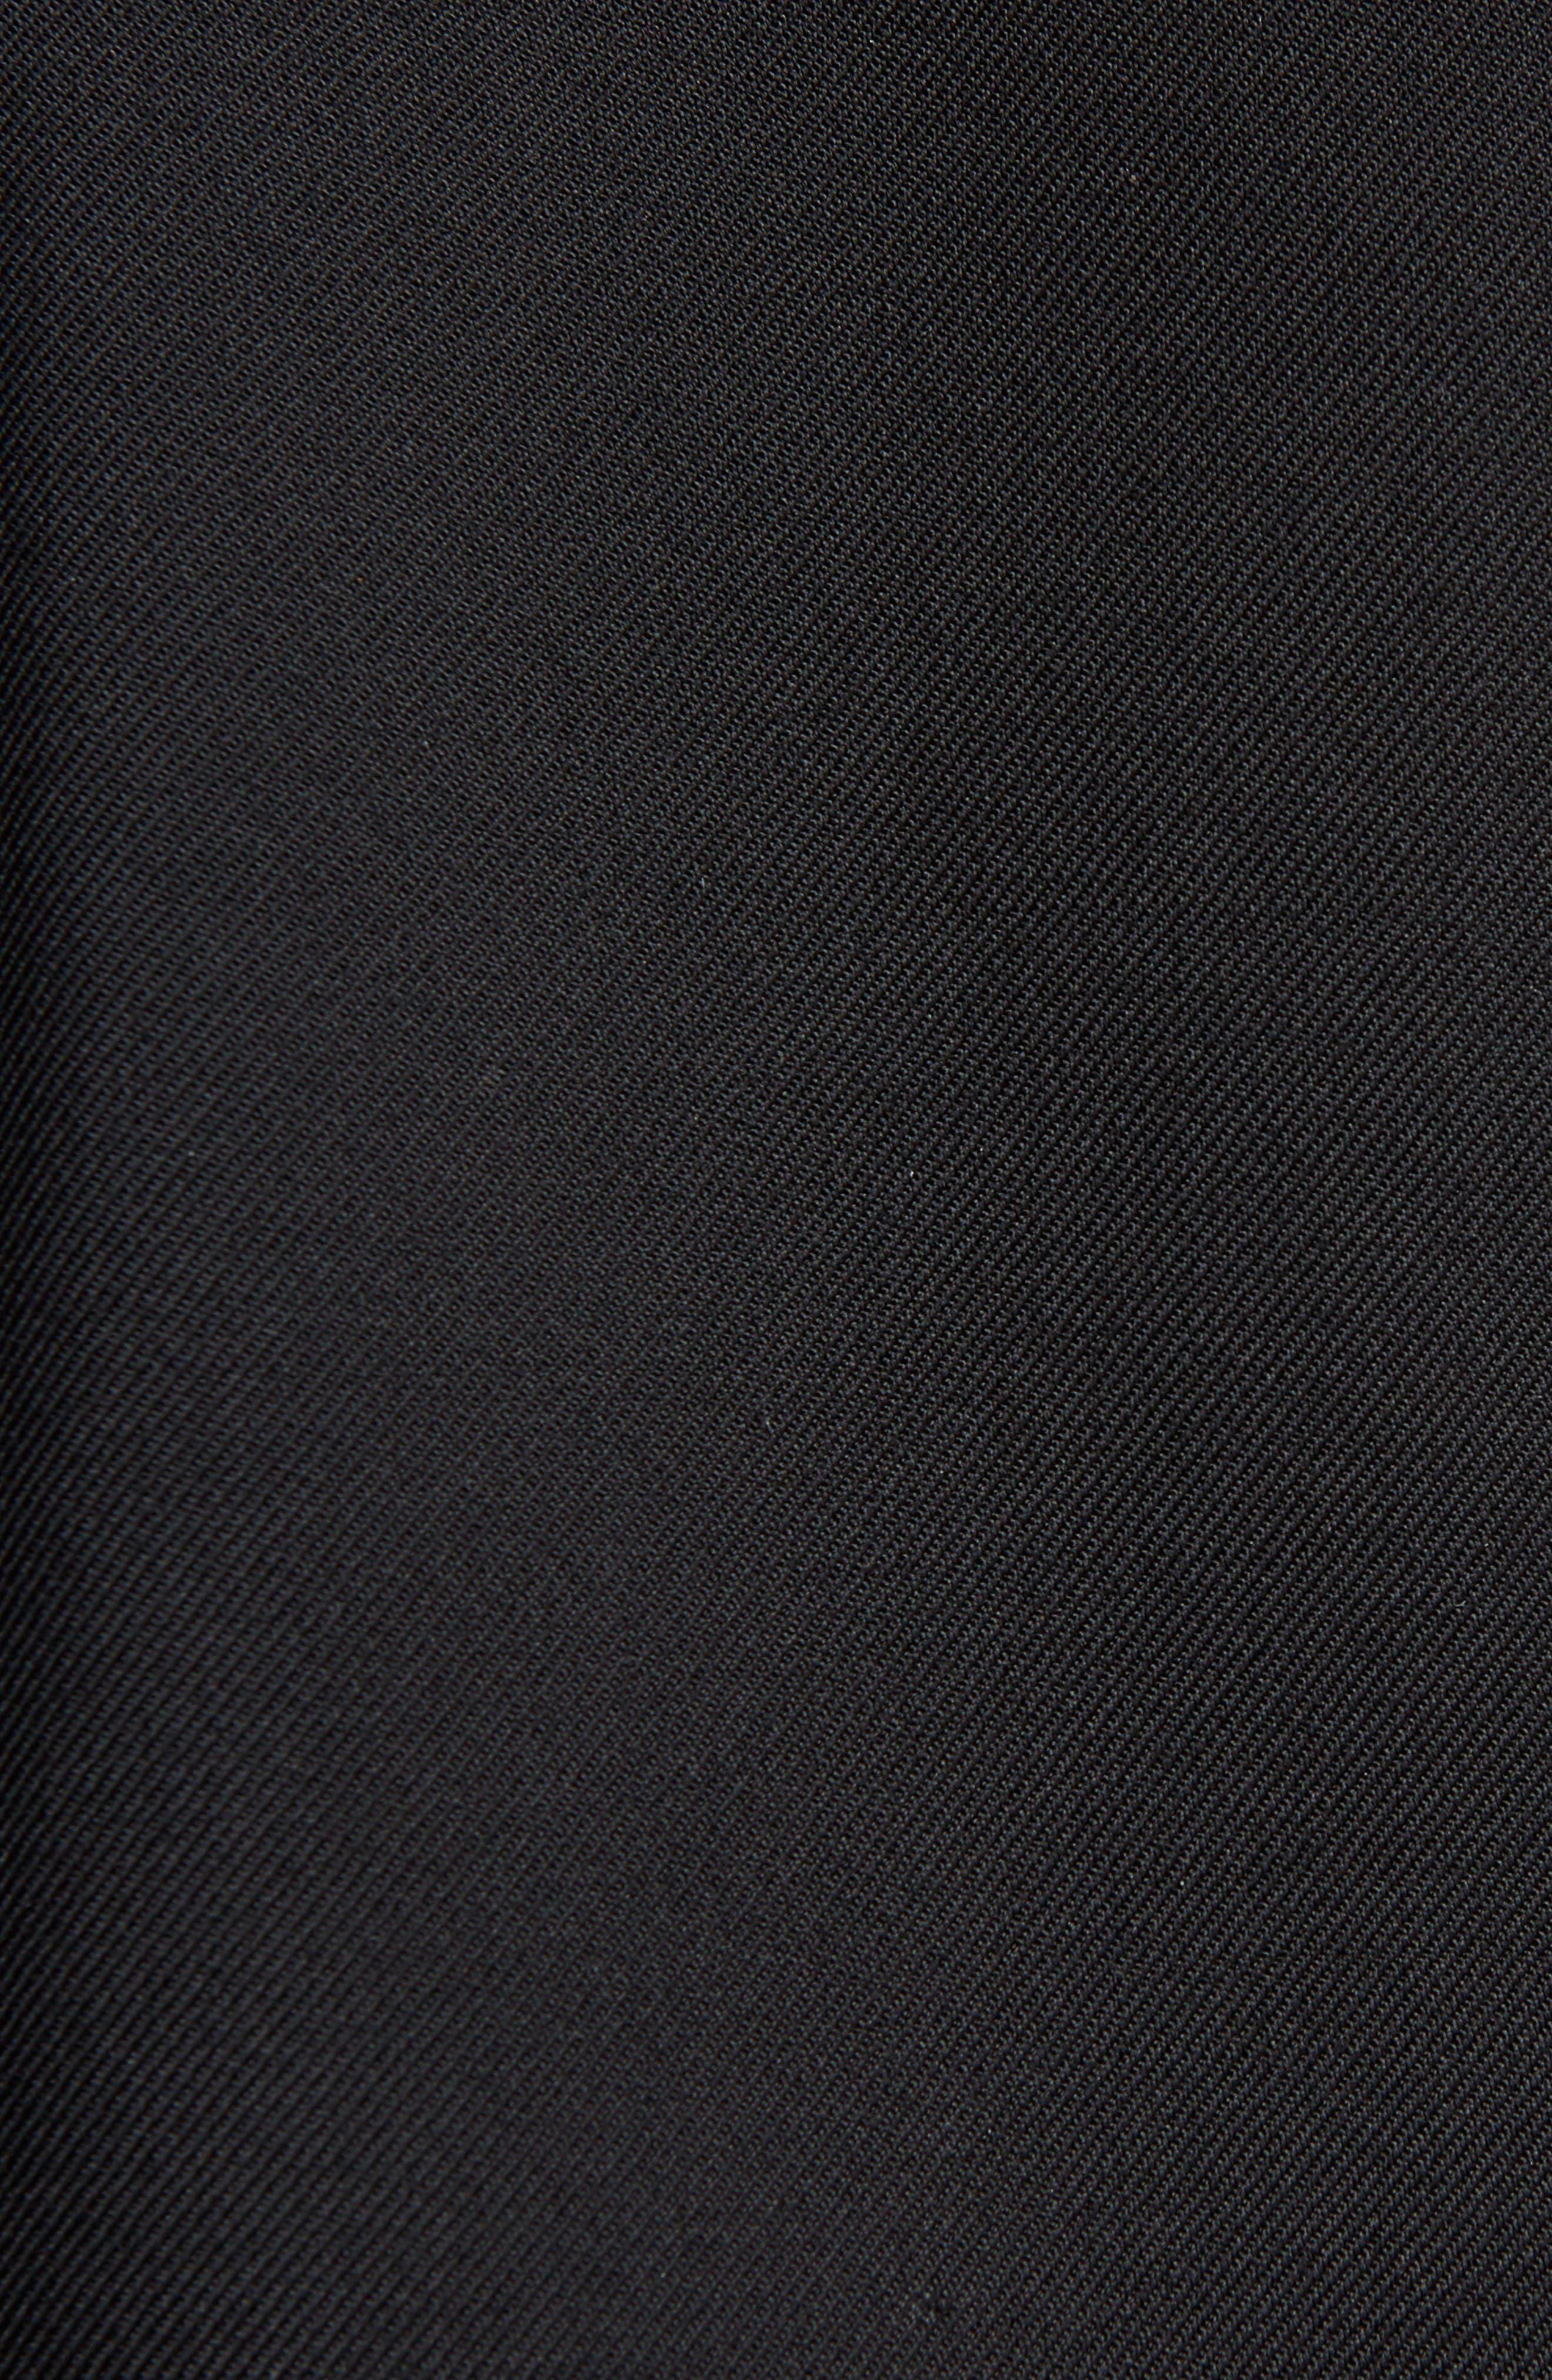 Alternate Image 3  - Saint Laurent Wool Crop Officer Jacket